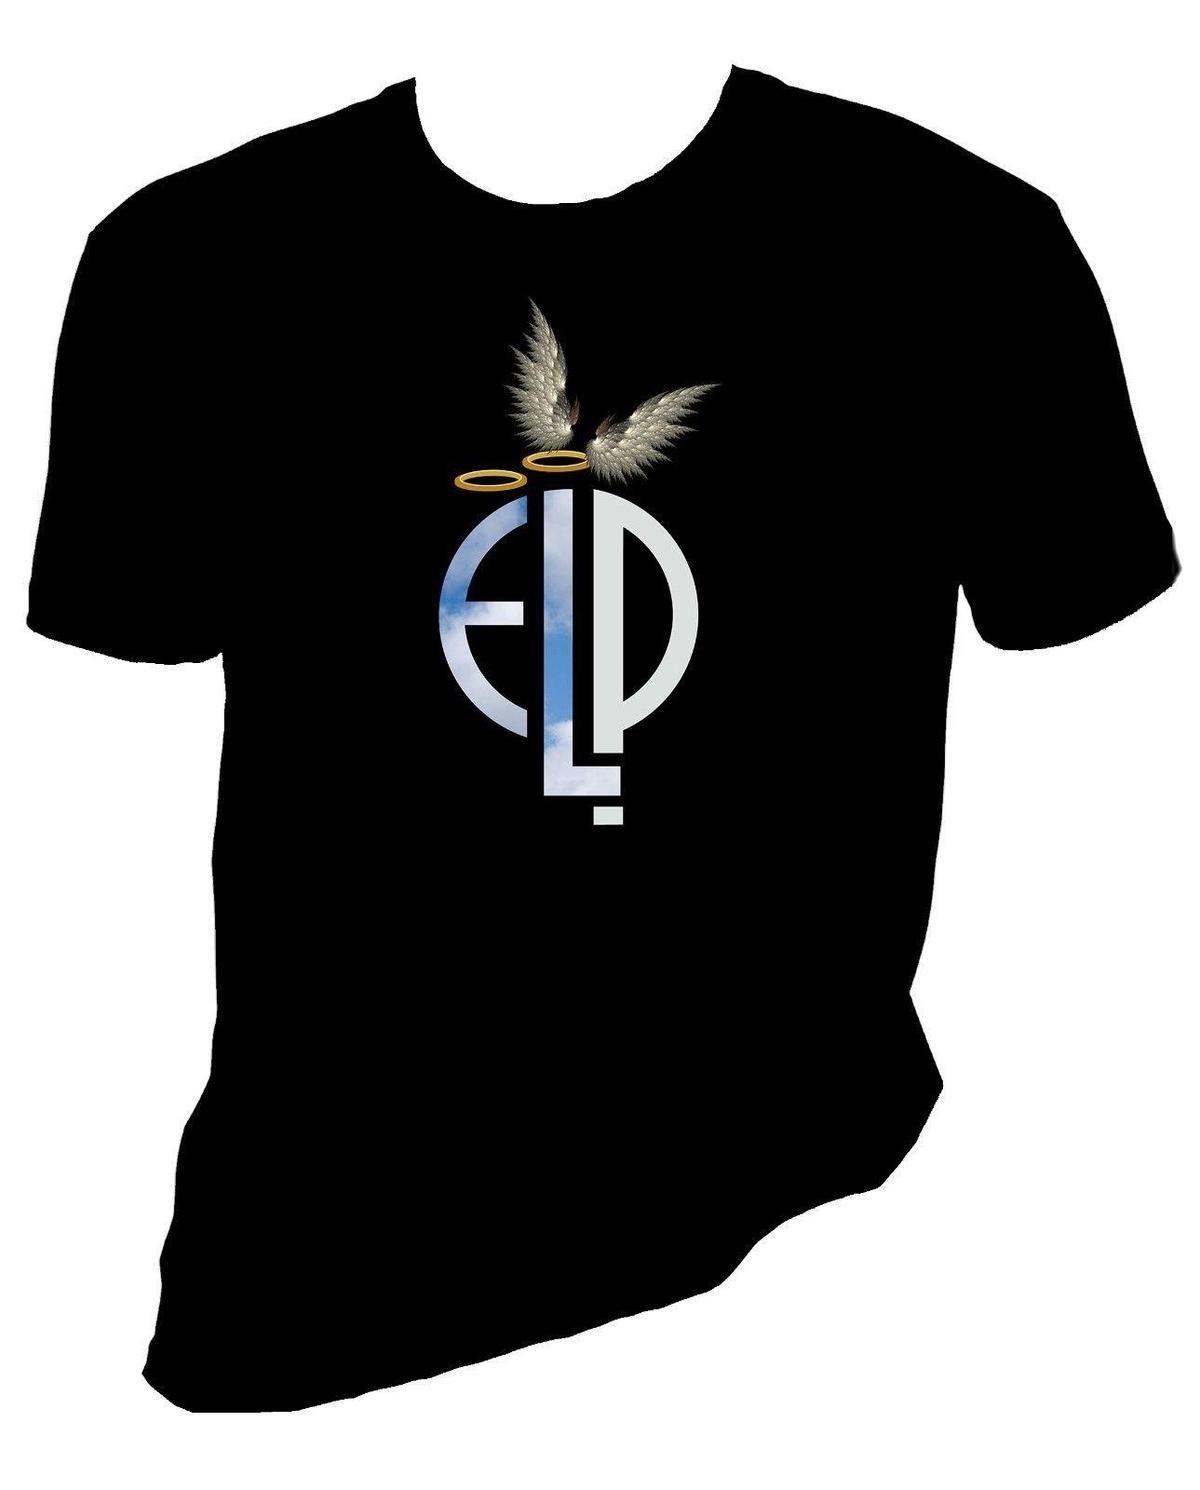 ÁngelElpGreg Palmer Con EmersonLake S De Halo Y 6x Camiseta LakeTallas Alas shQCdtr